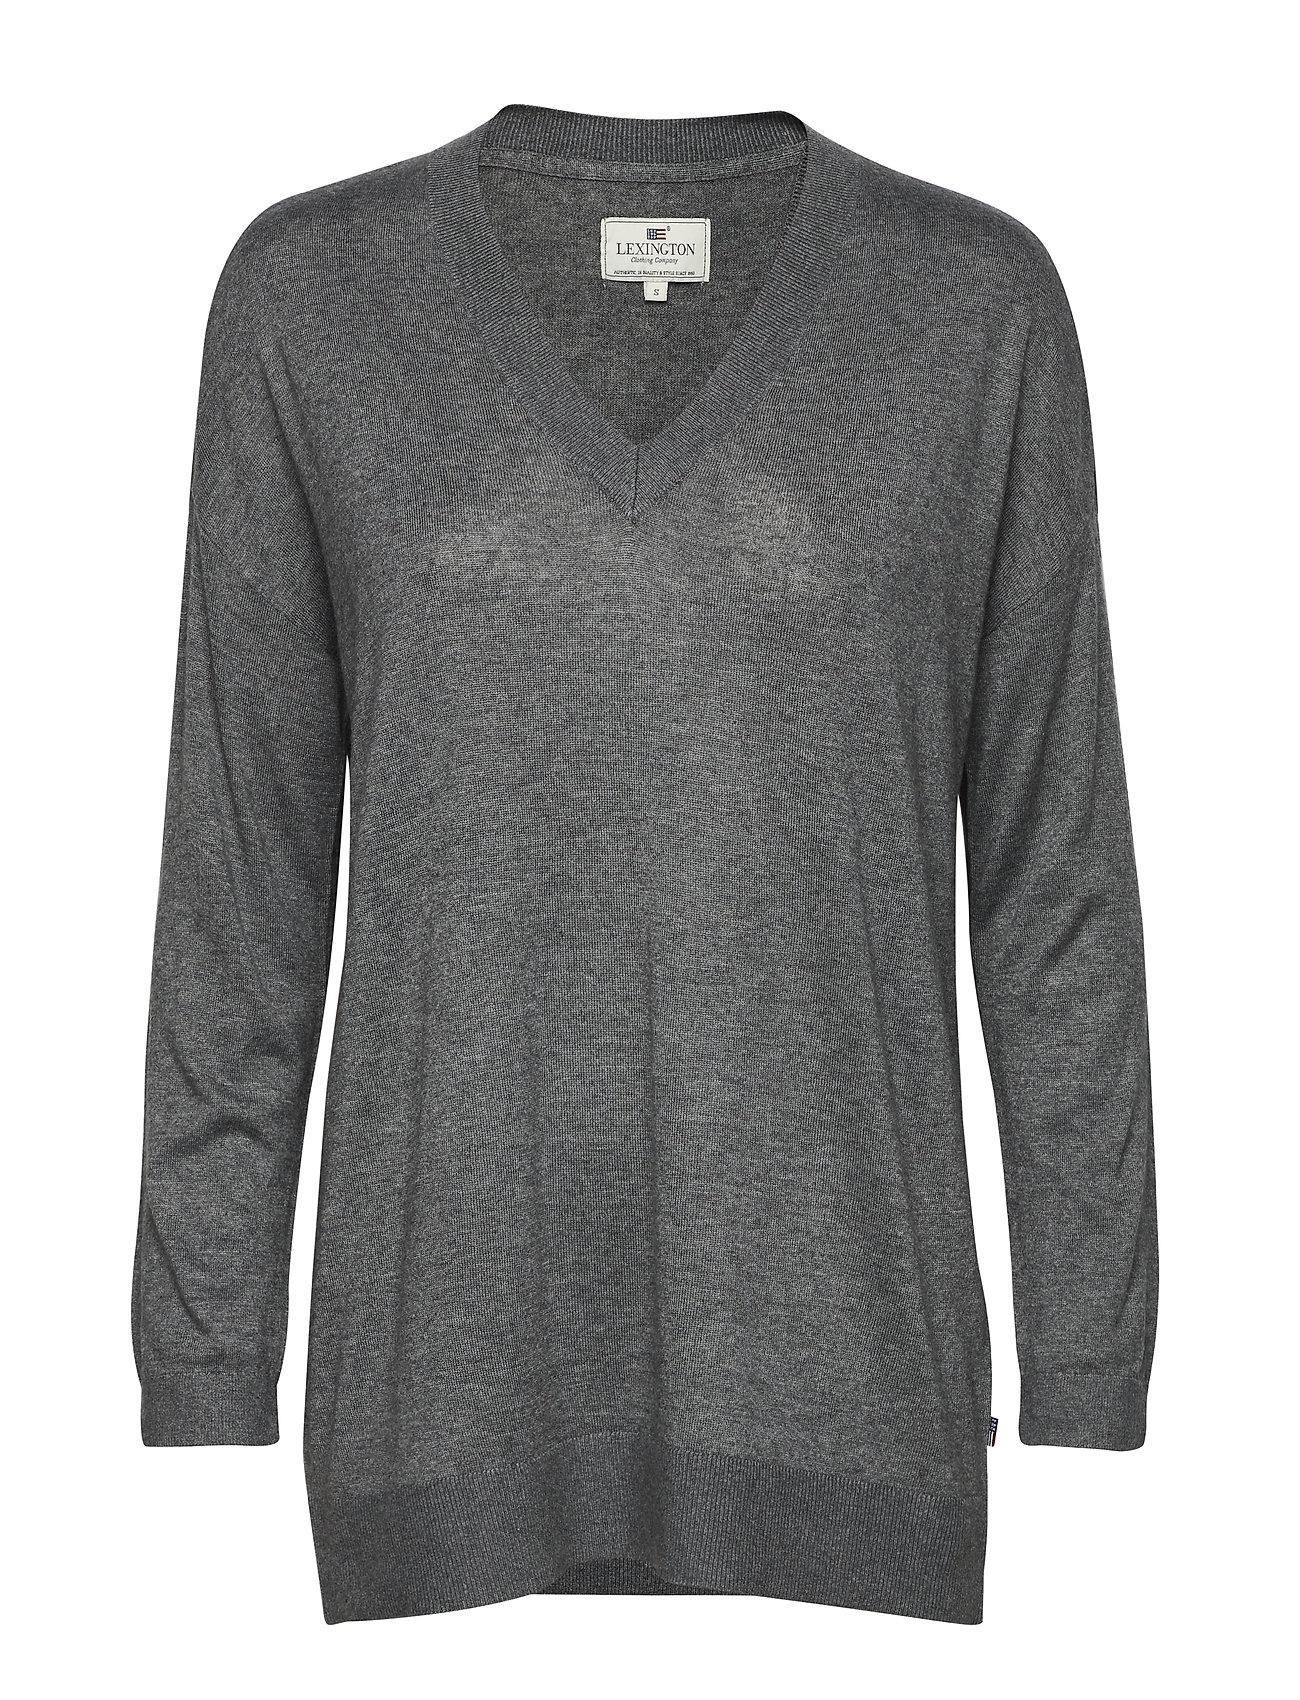 Lexington Clothing Ana Cotton Bamboo Sweater - HEATHER GRAY MELANGE